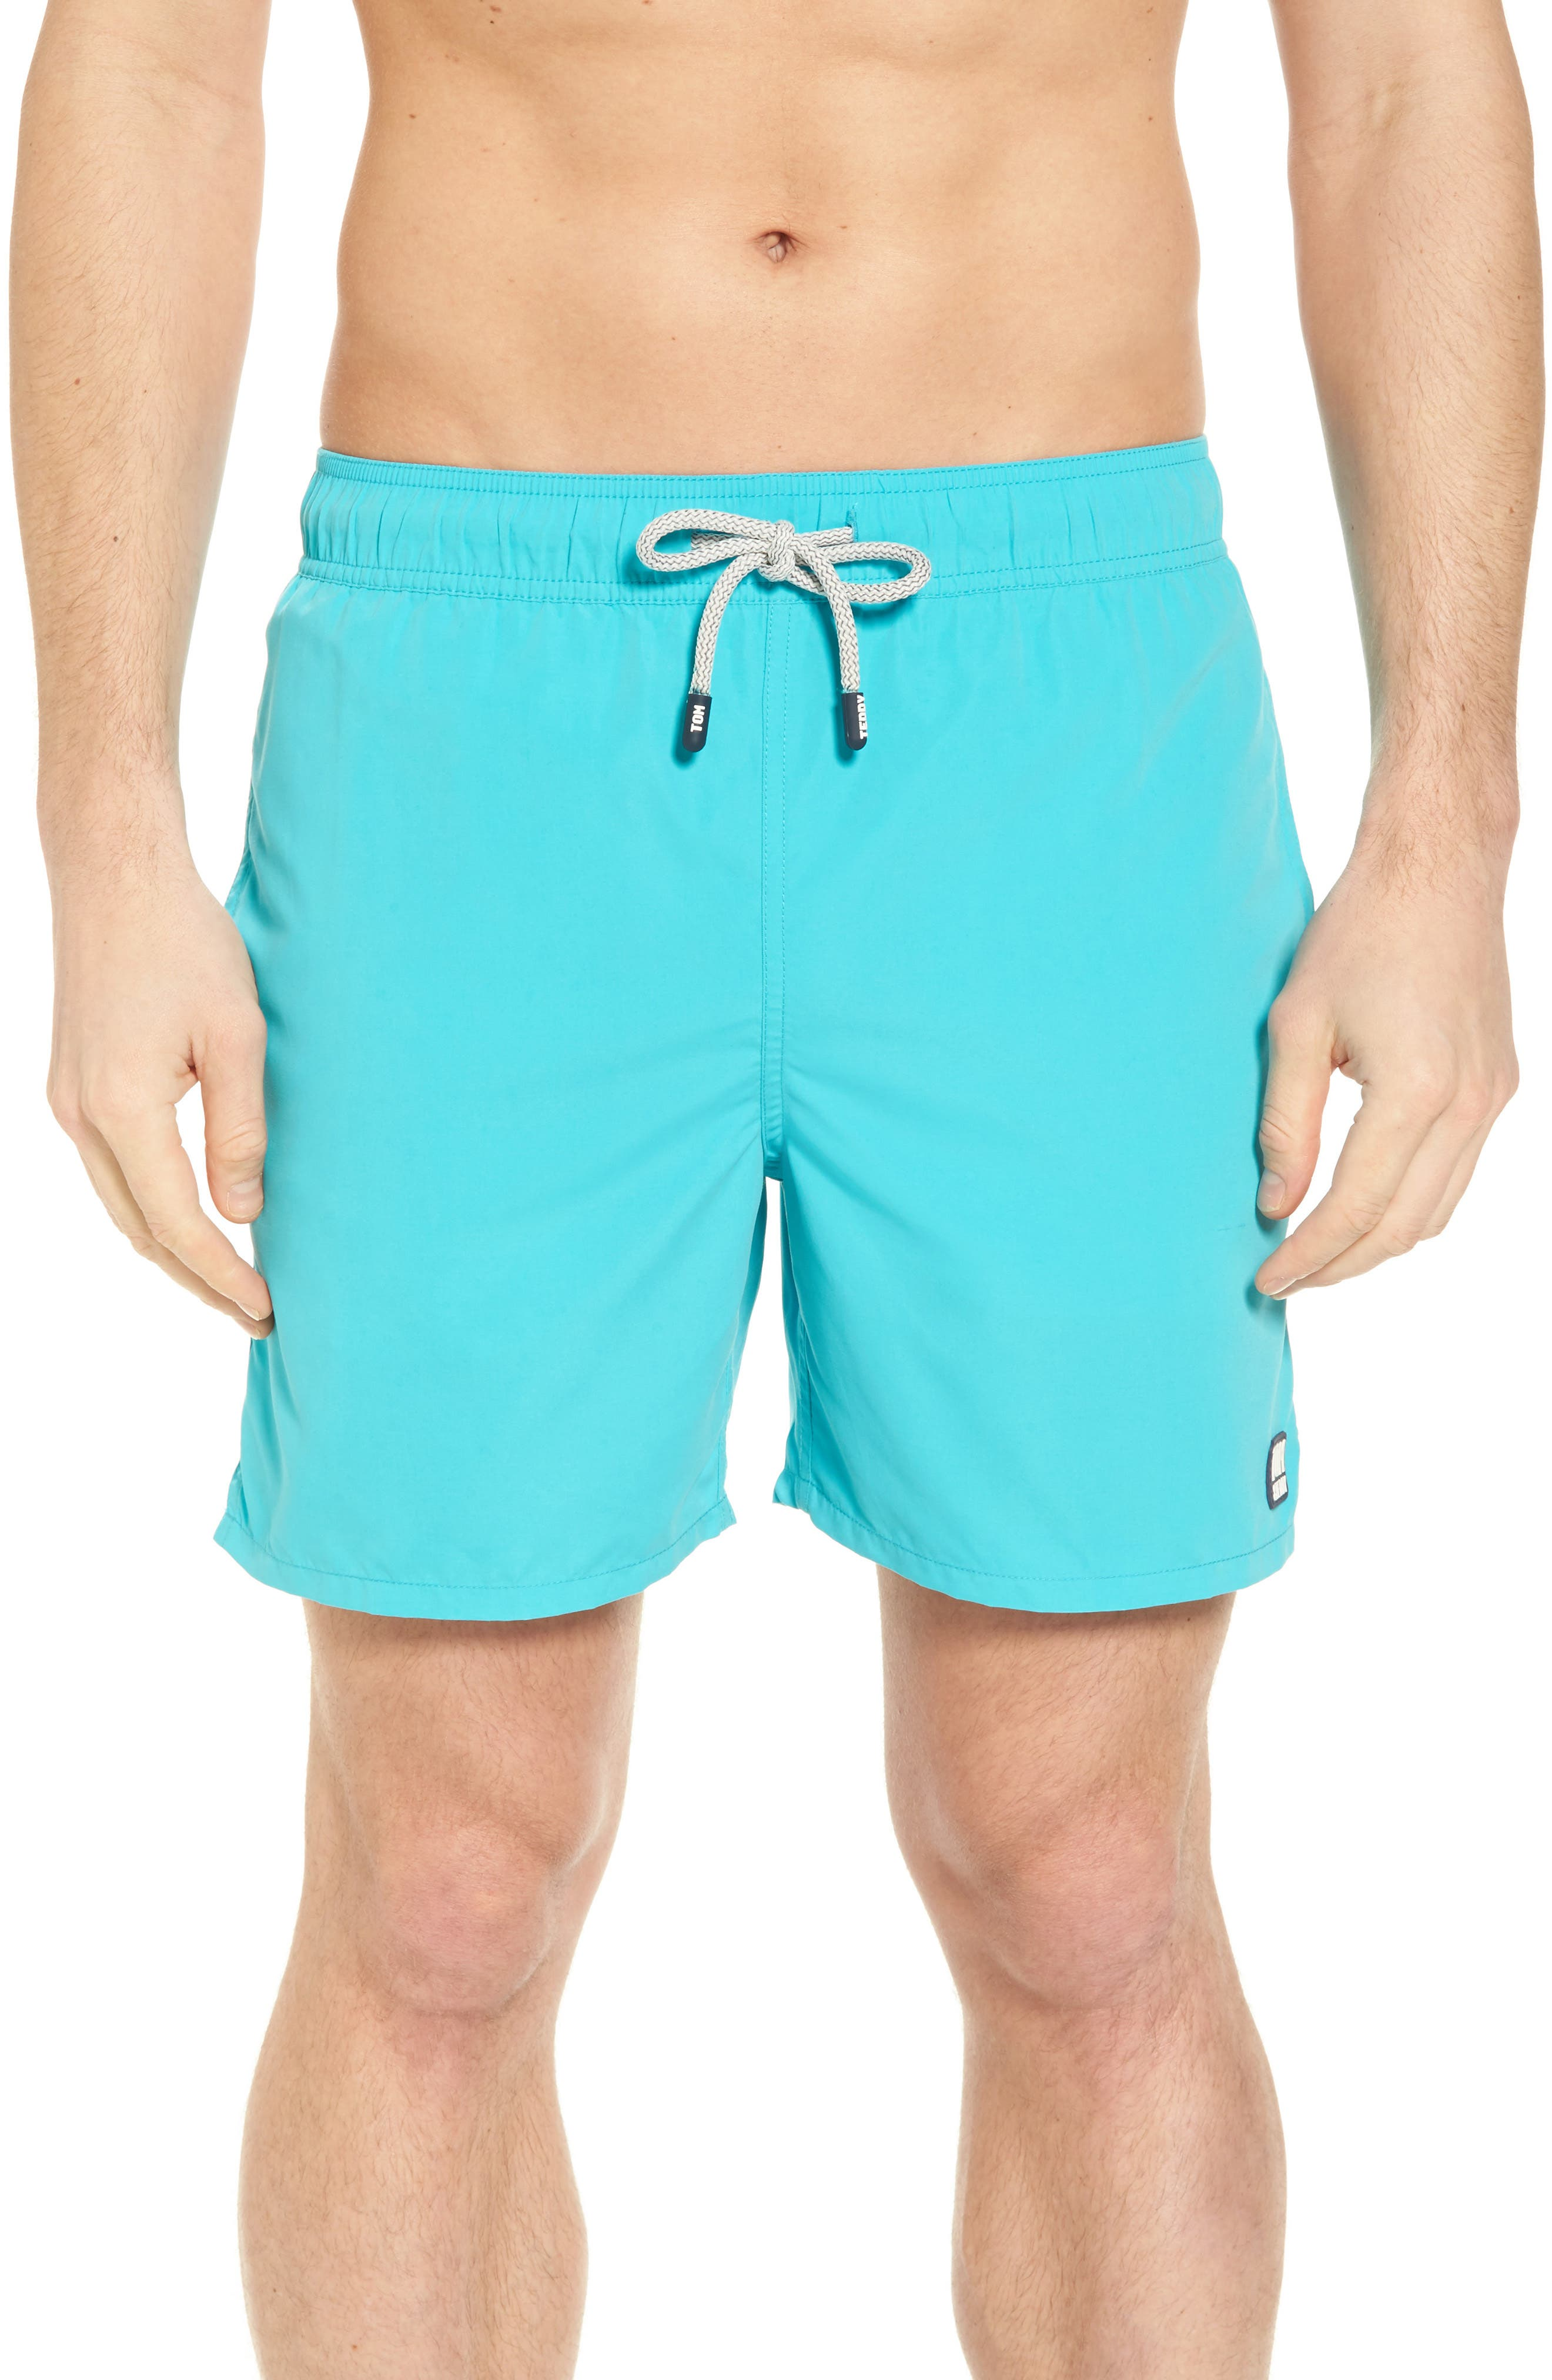 Solid Swim Trunks,                         Main,                         color, Pool Blue